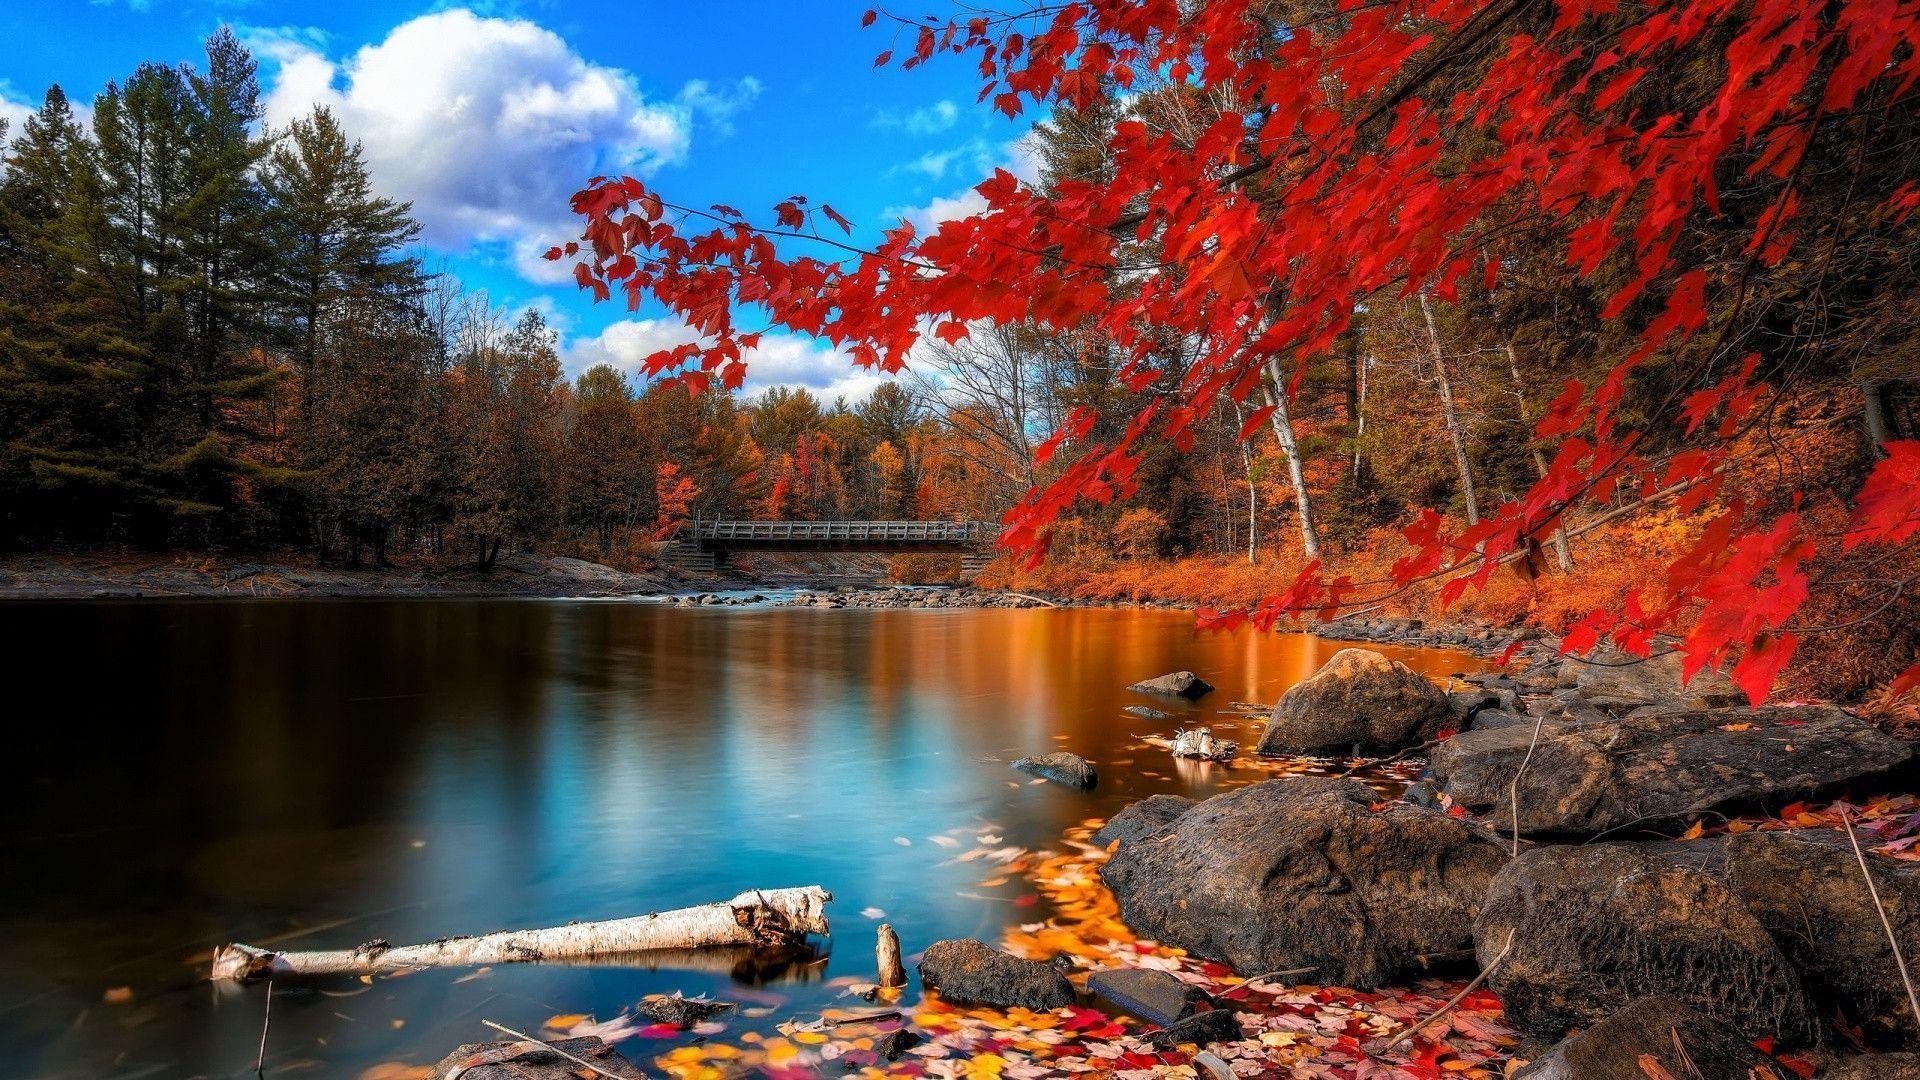 Autumn Forest Scenery Wallpaper 4k Desktop 126036 Hd Wallpaper Backgrounds Download